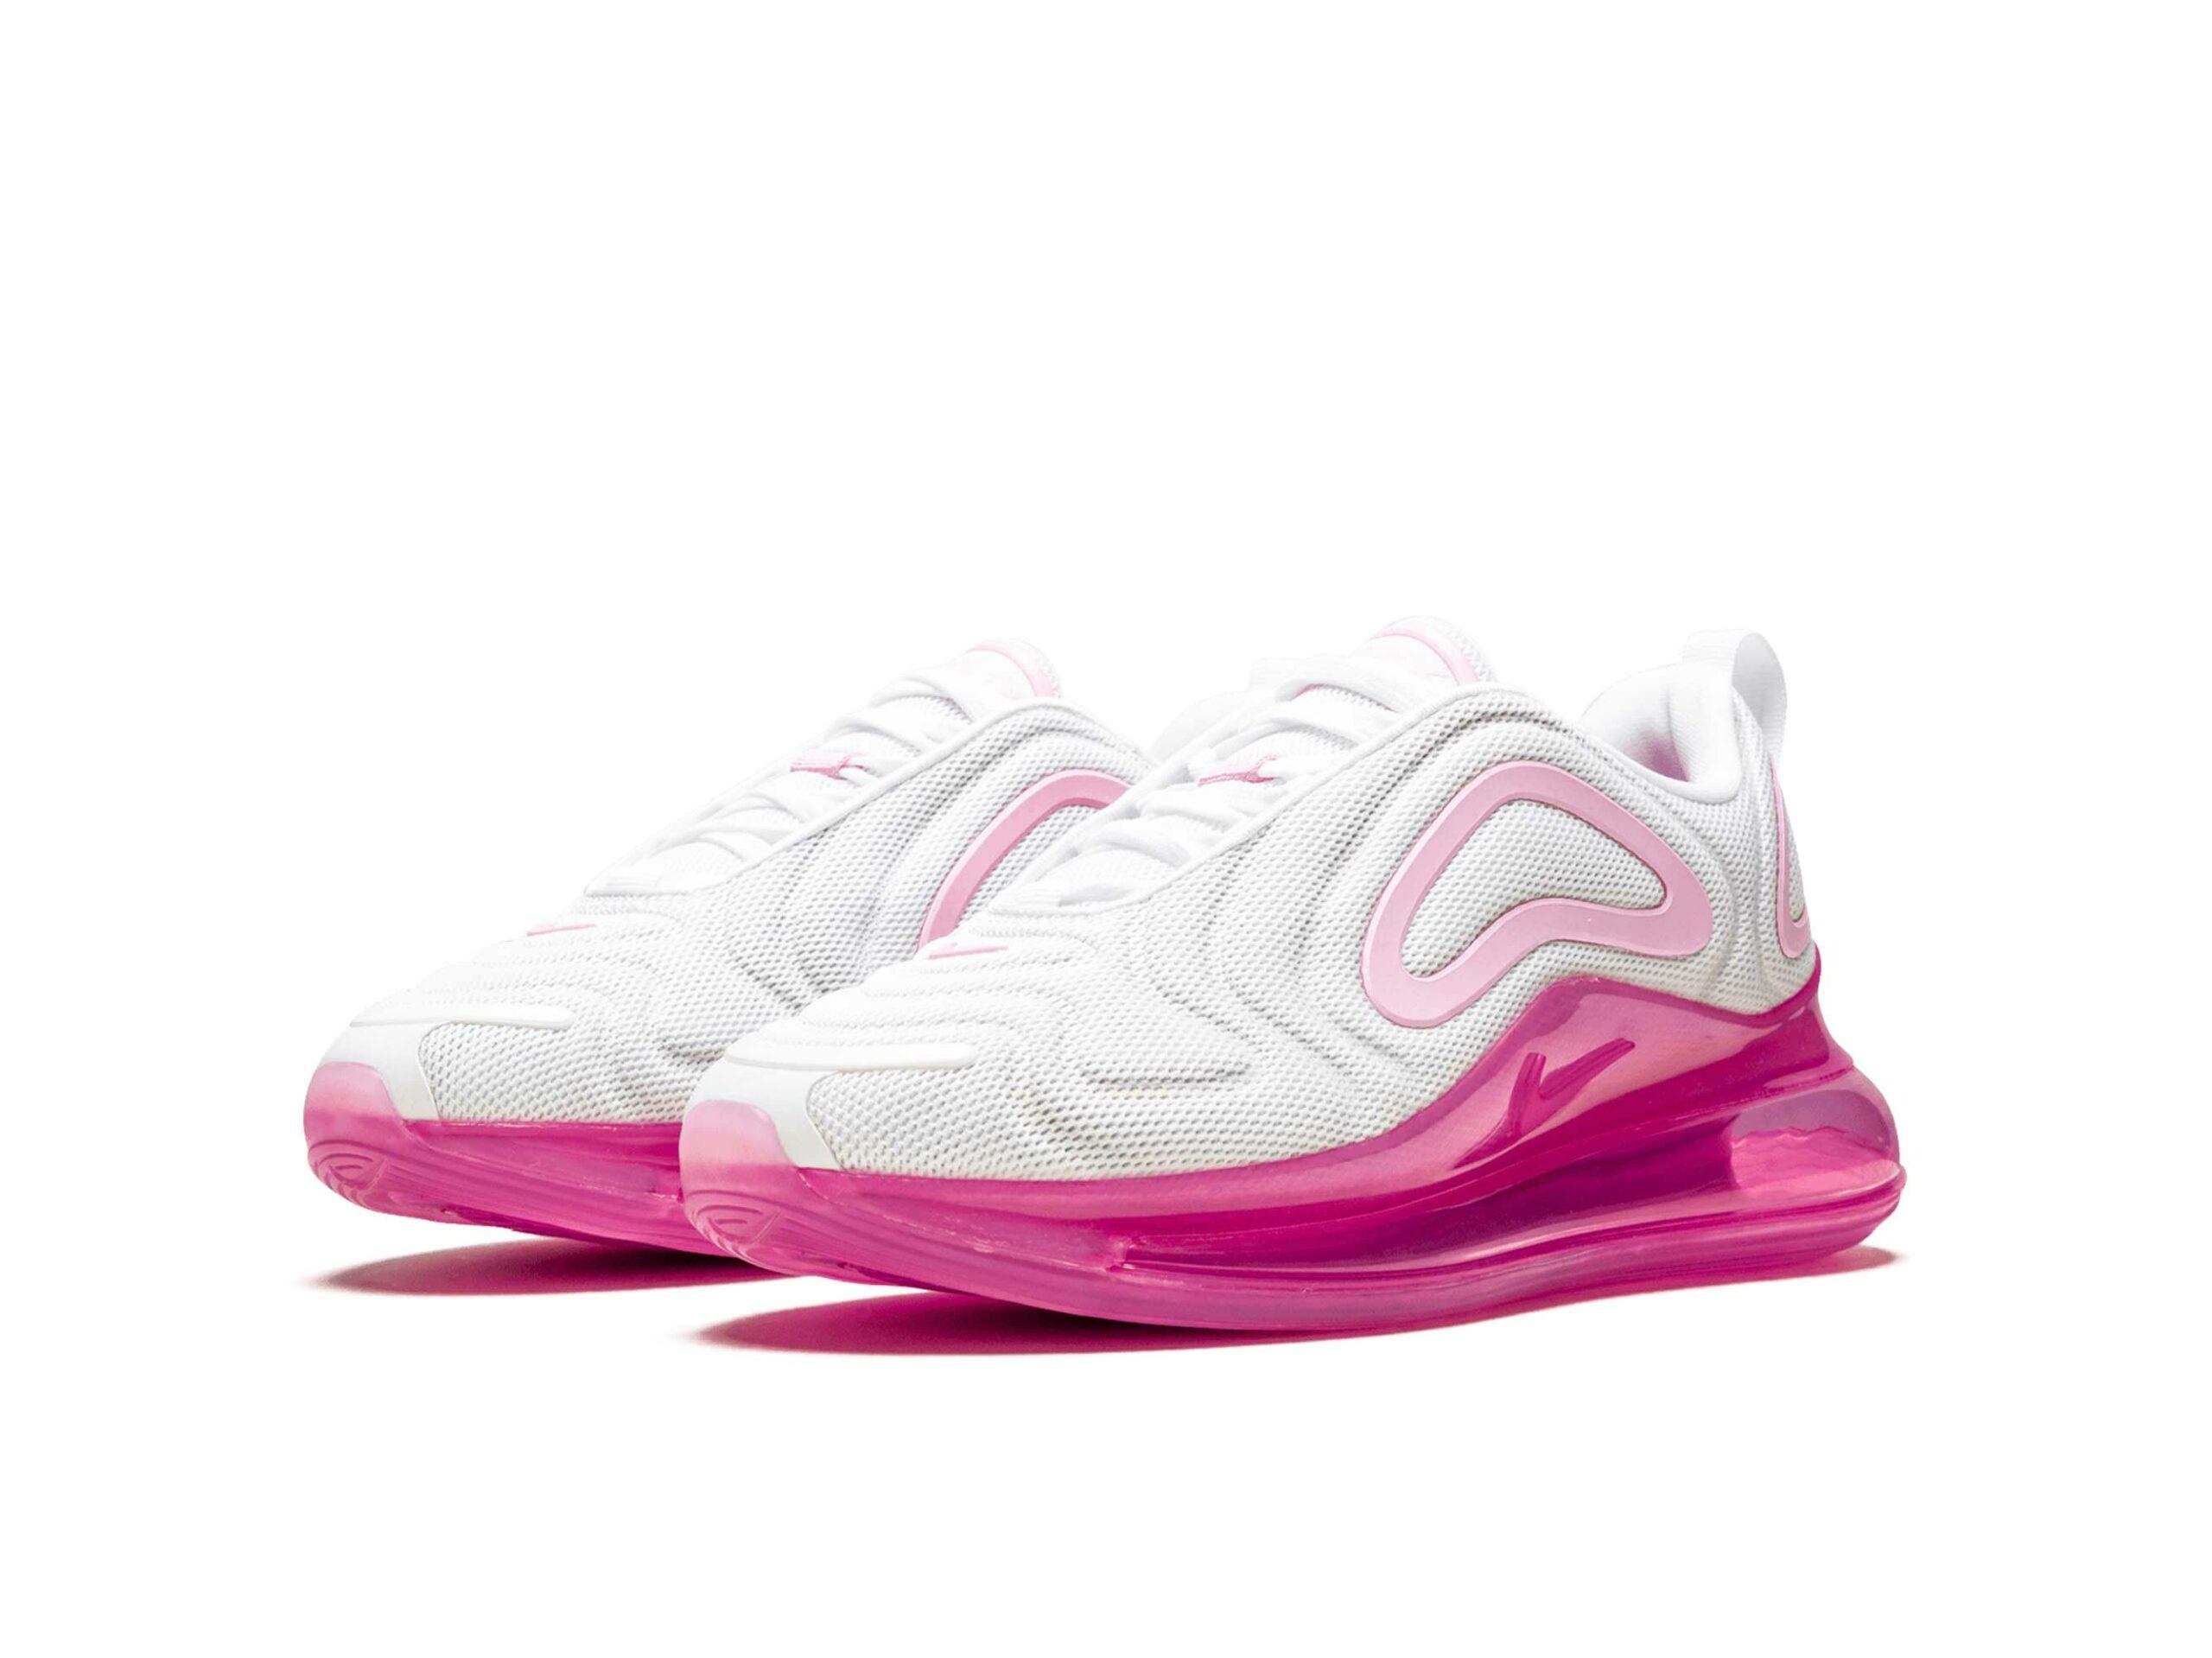 nike air max 720 pink AR9293_103 купить